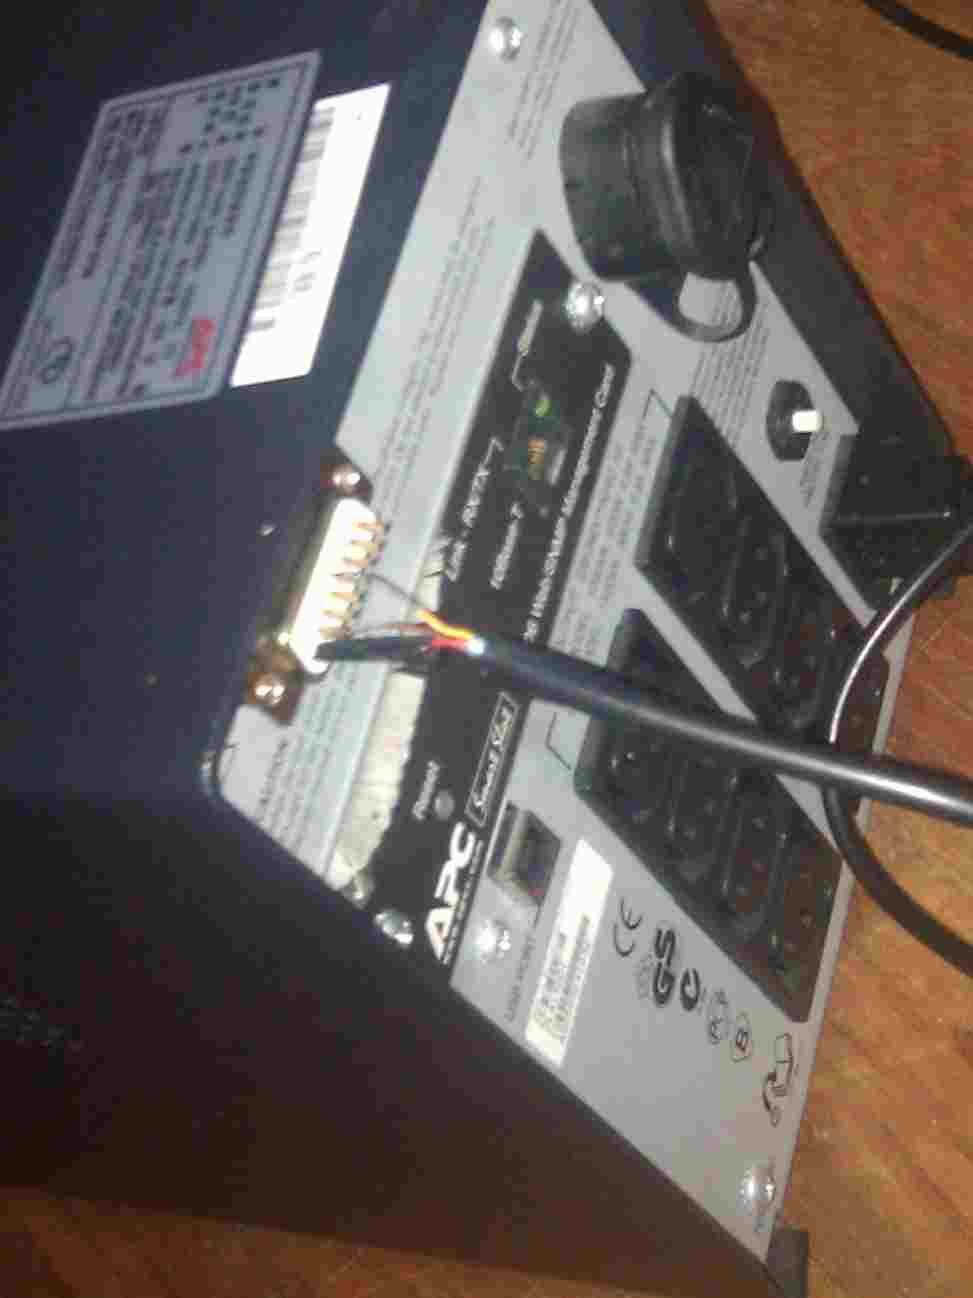 medium resolution of apc ups usb cable pinout binarymistrh blog binarymist net design